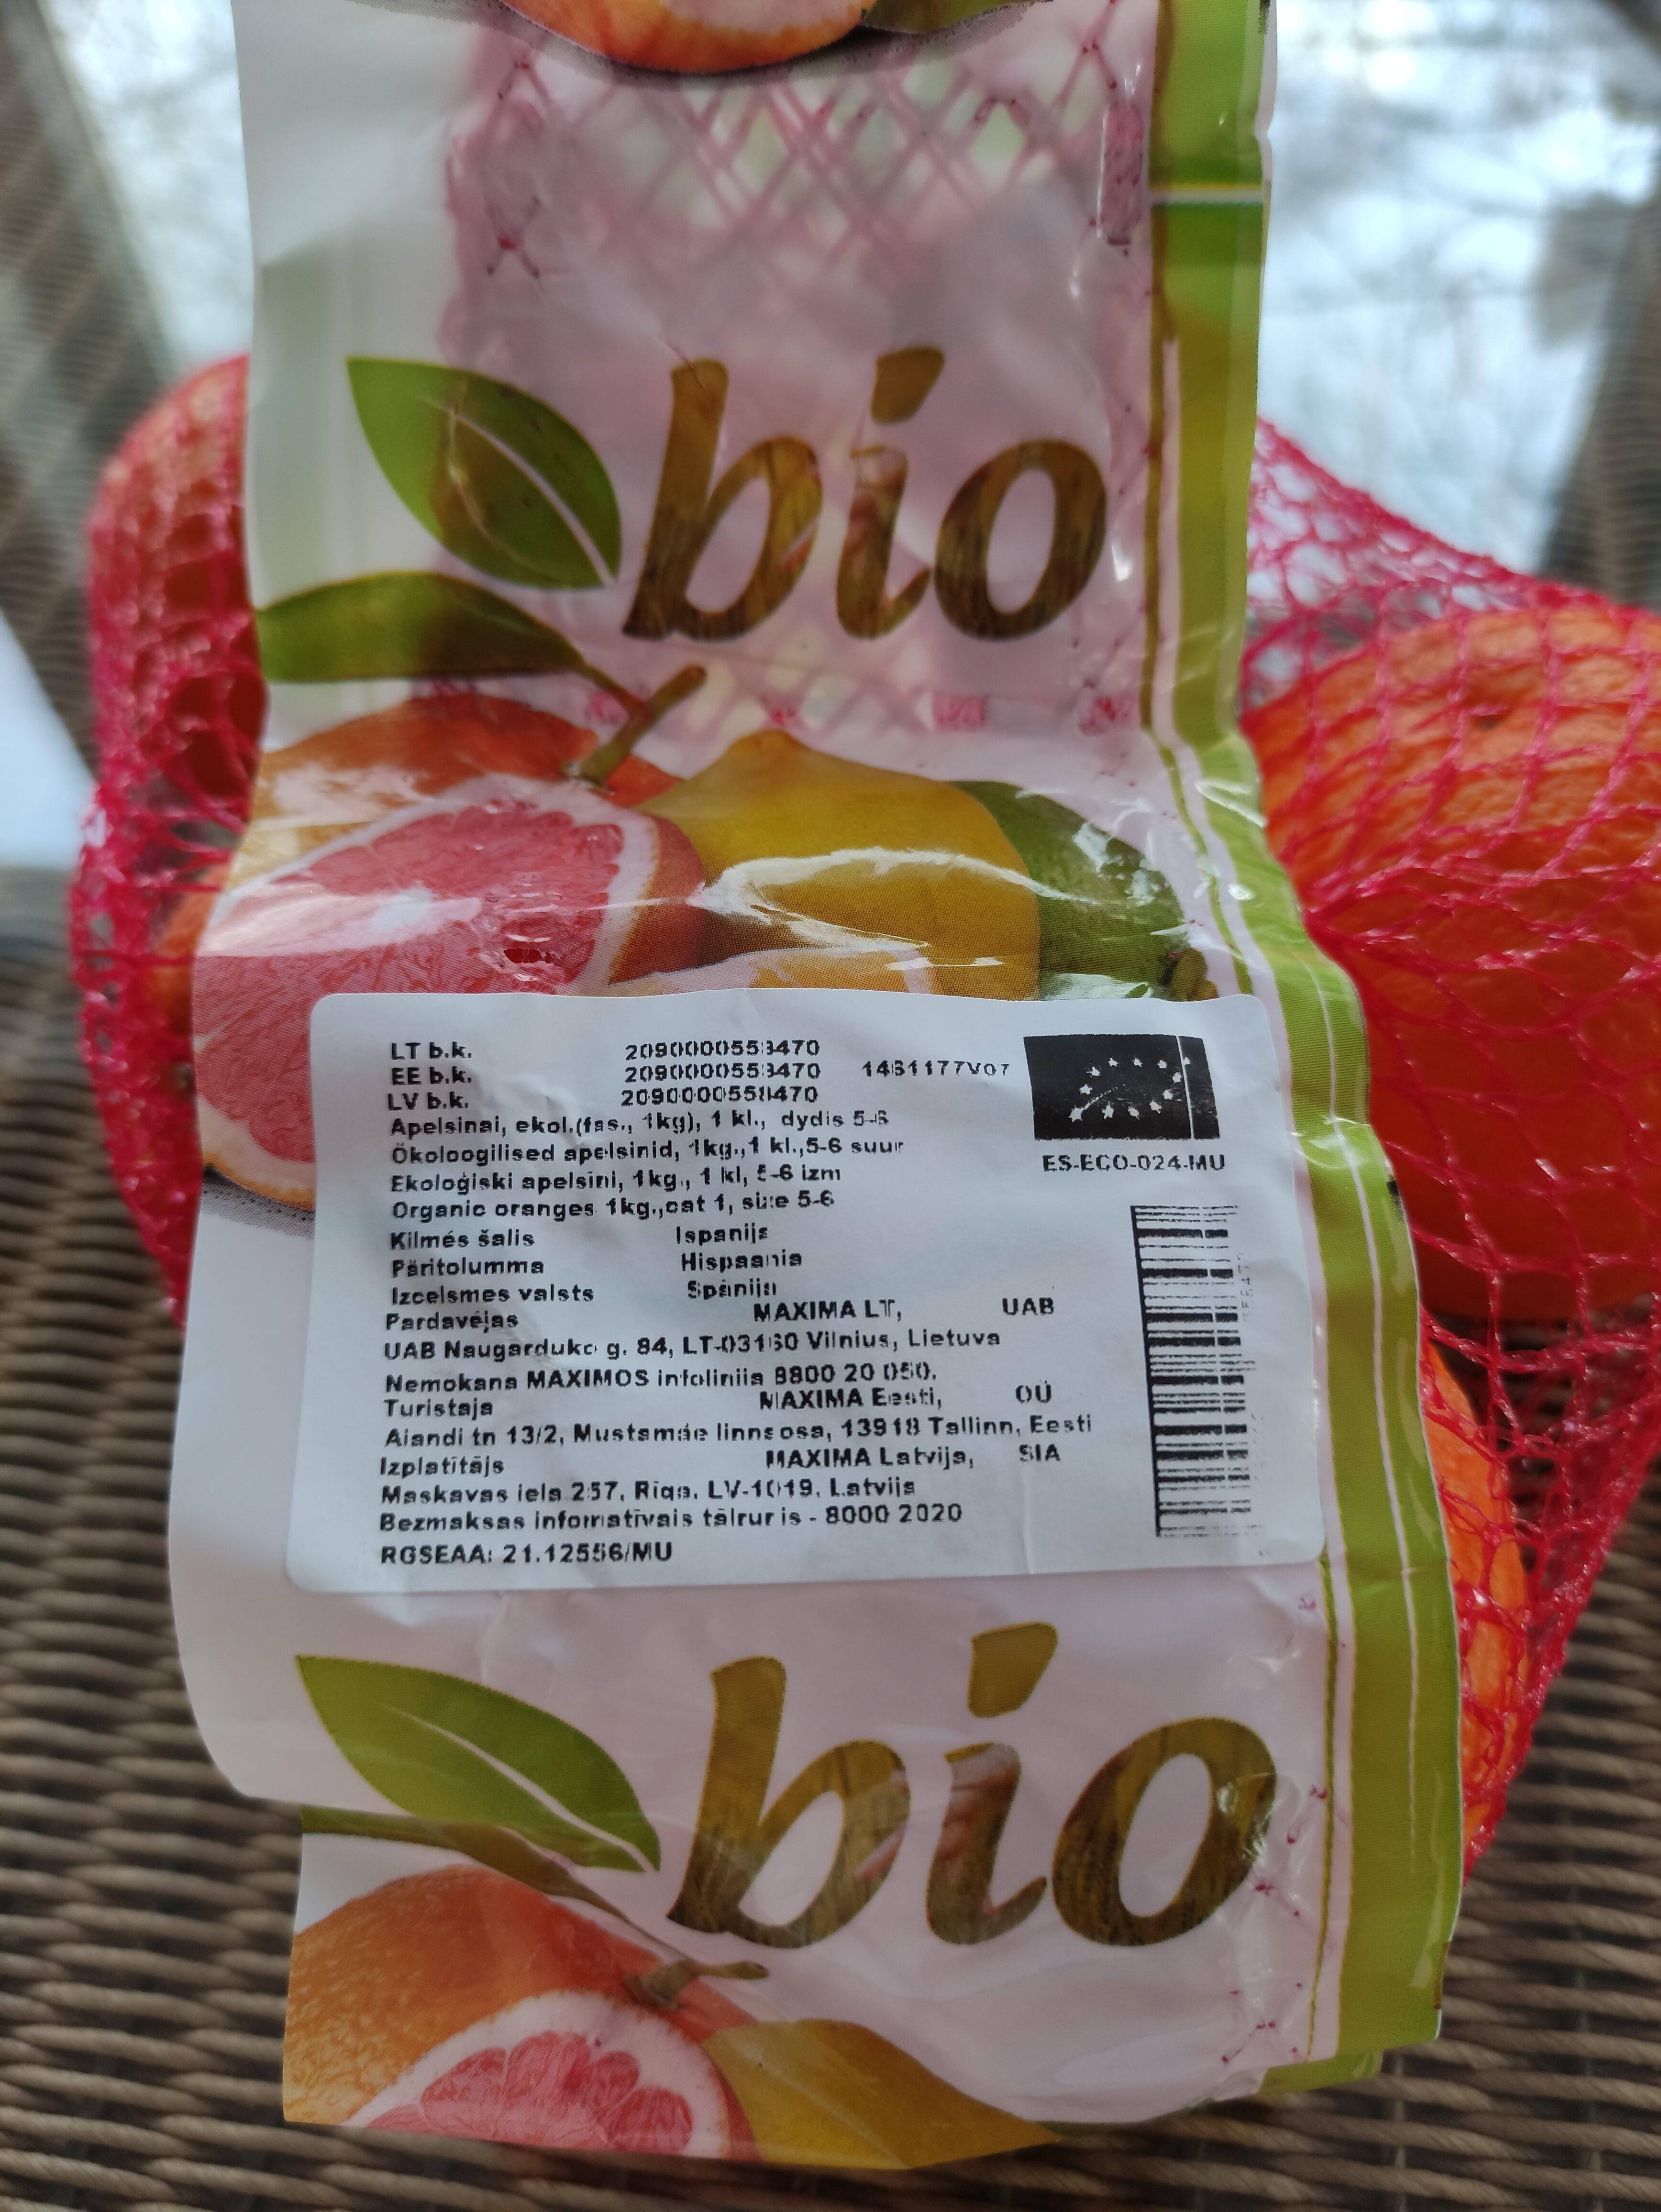 Organic Oranges, Cat 1, Size 5-6 - Produktas - en